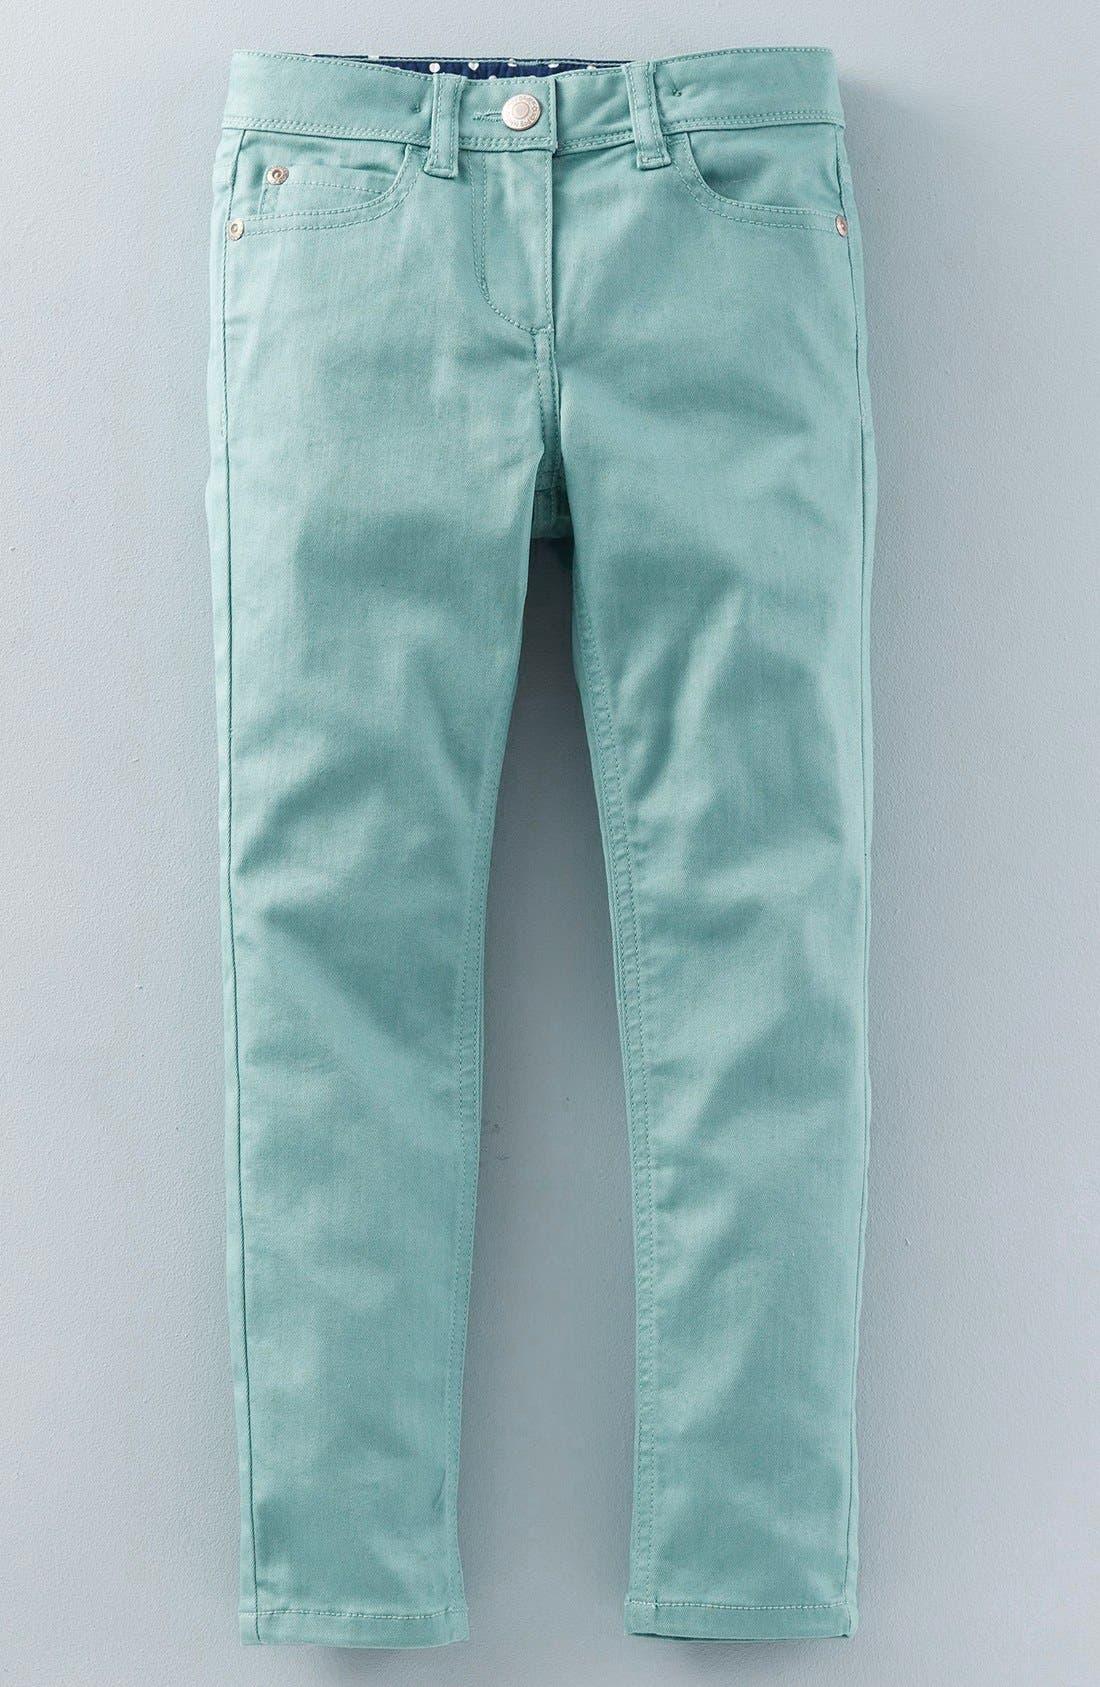 Alternate Image 1 Selected - Mini Boden Super Skinny Fit Jeans (Toddler Girls, Little Girls & Big Girls)